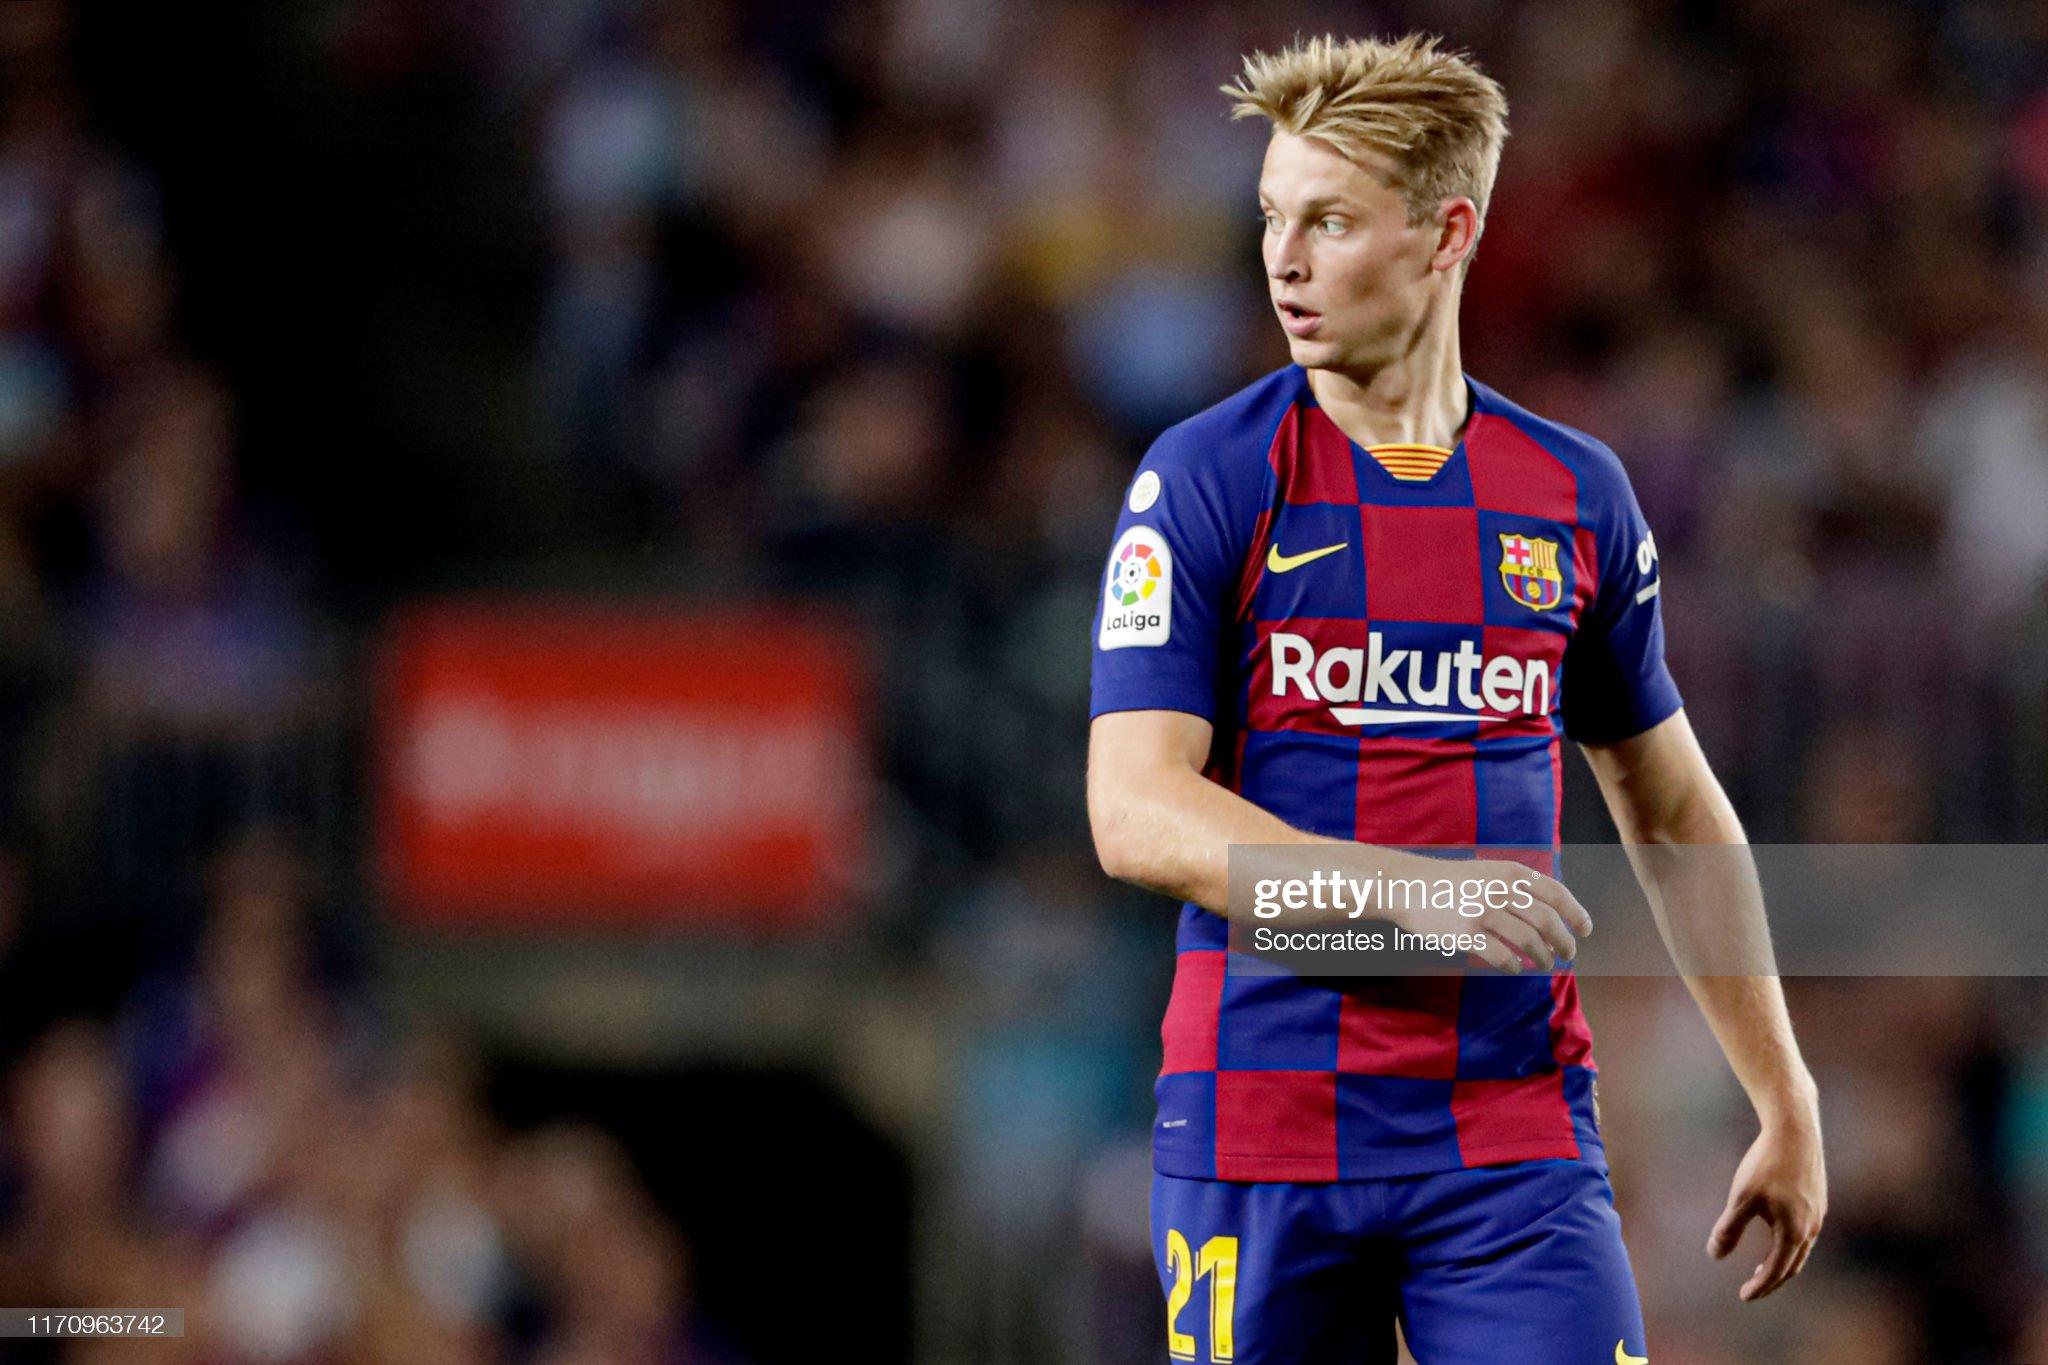 صور مباراة : برشلونة - فياريال 2-1 ( 24-09-2019 )  Frenkie-de-jong-of-fc-barcelona-during-the-la-liga-santander-match-picture-id1170963742?s=2048x2048